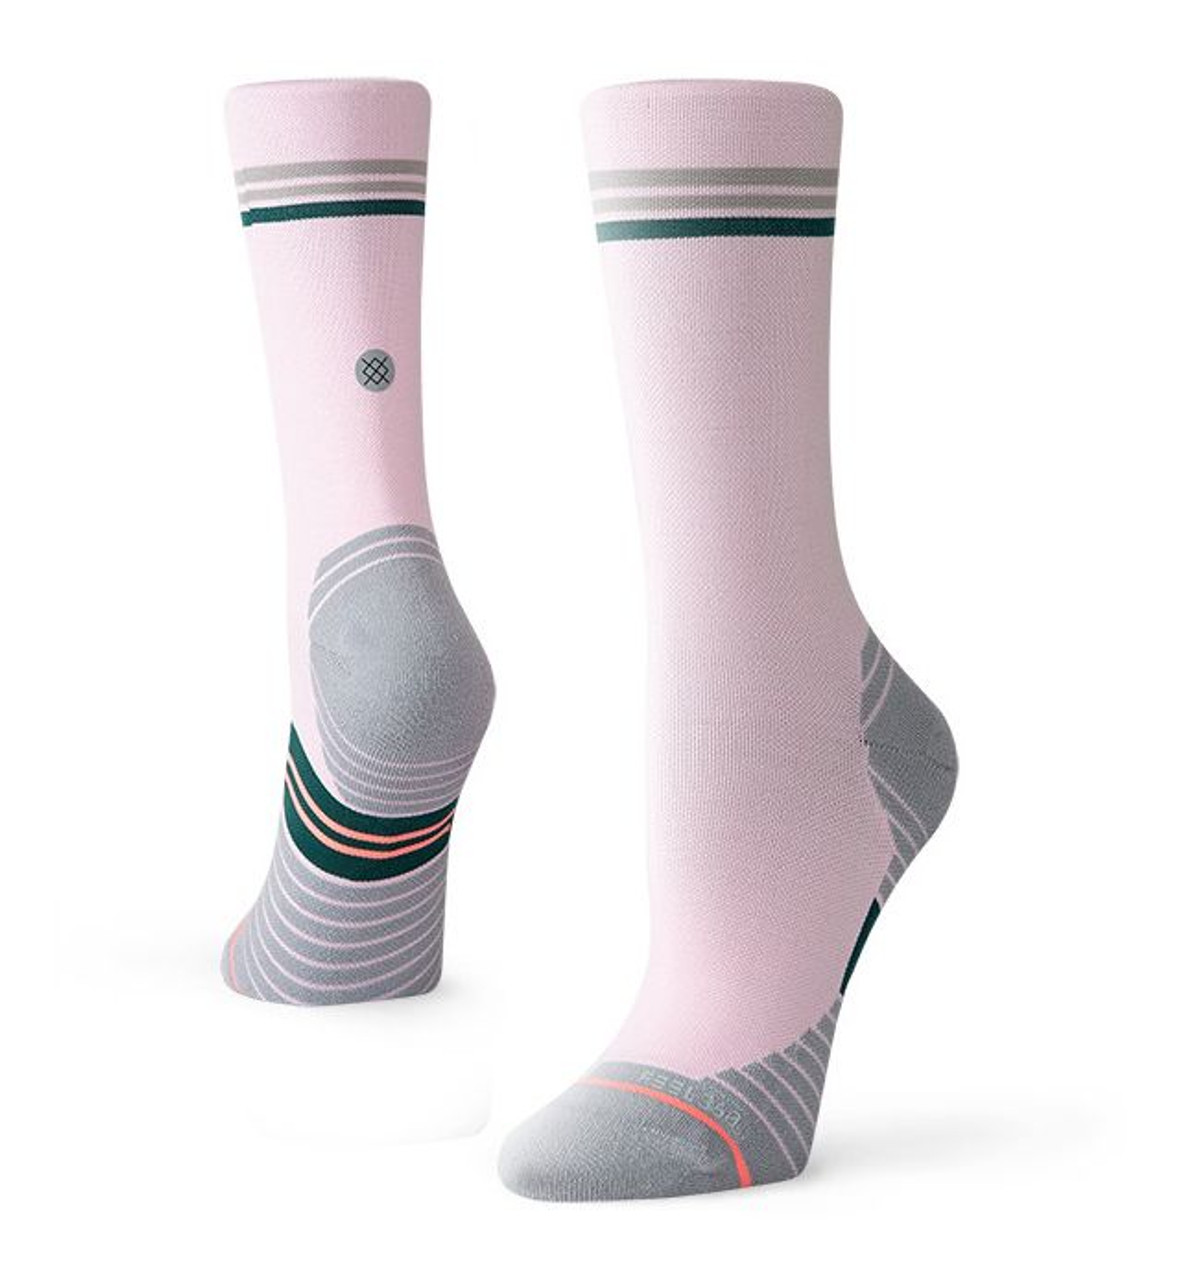 Women's Stance RUN Warm Up Crew Socks